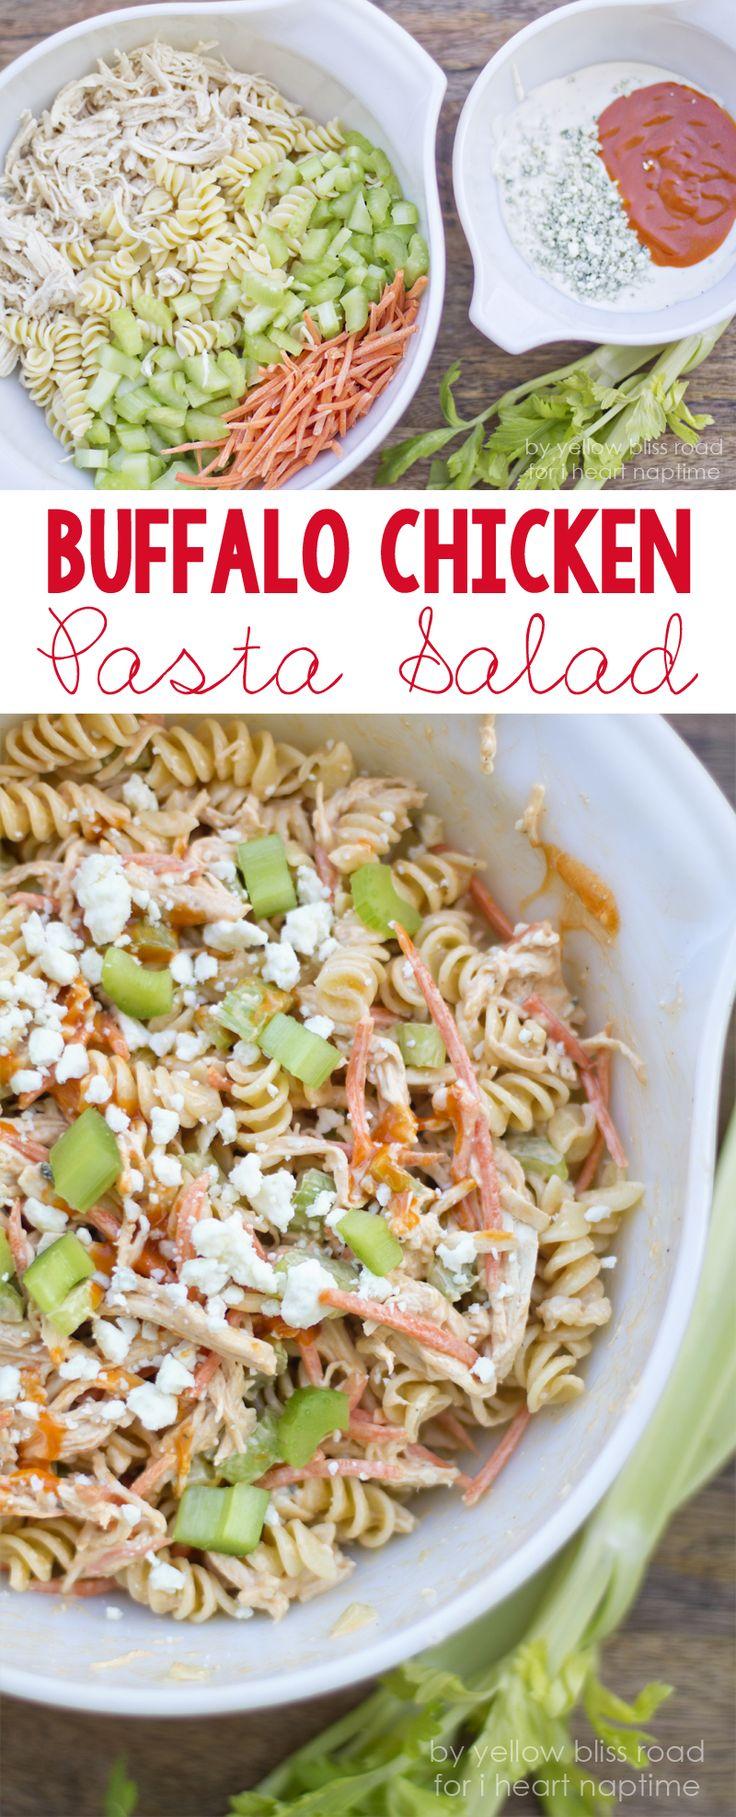 Buffalo Chicken Pasta Salad on iheartnaptime.com ...yum! #recipes